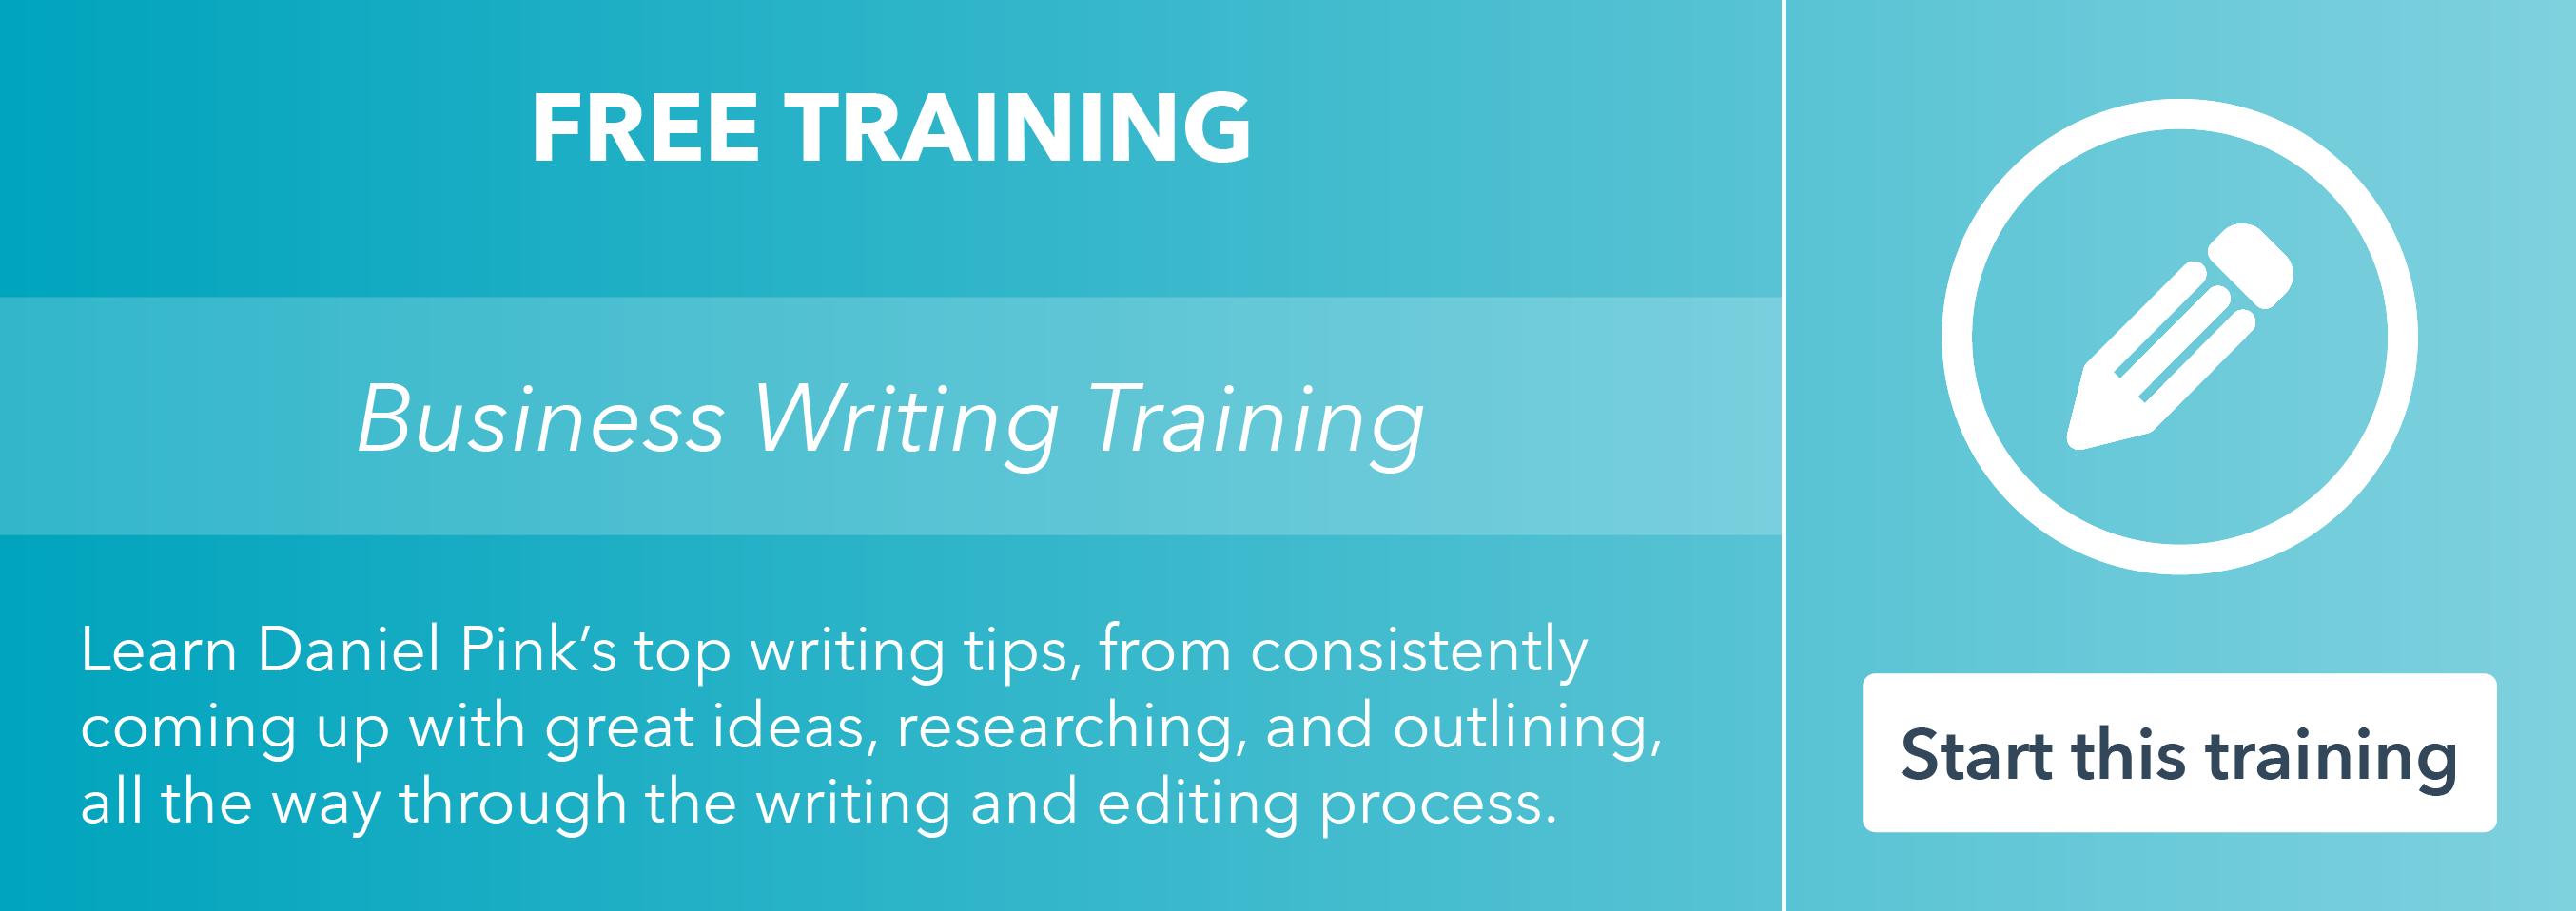 Segui la formazione di scrittura aziendale gratuita di HubSpot Academy